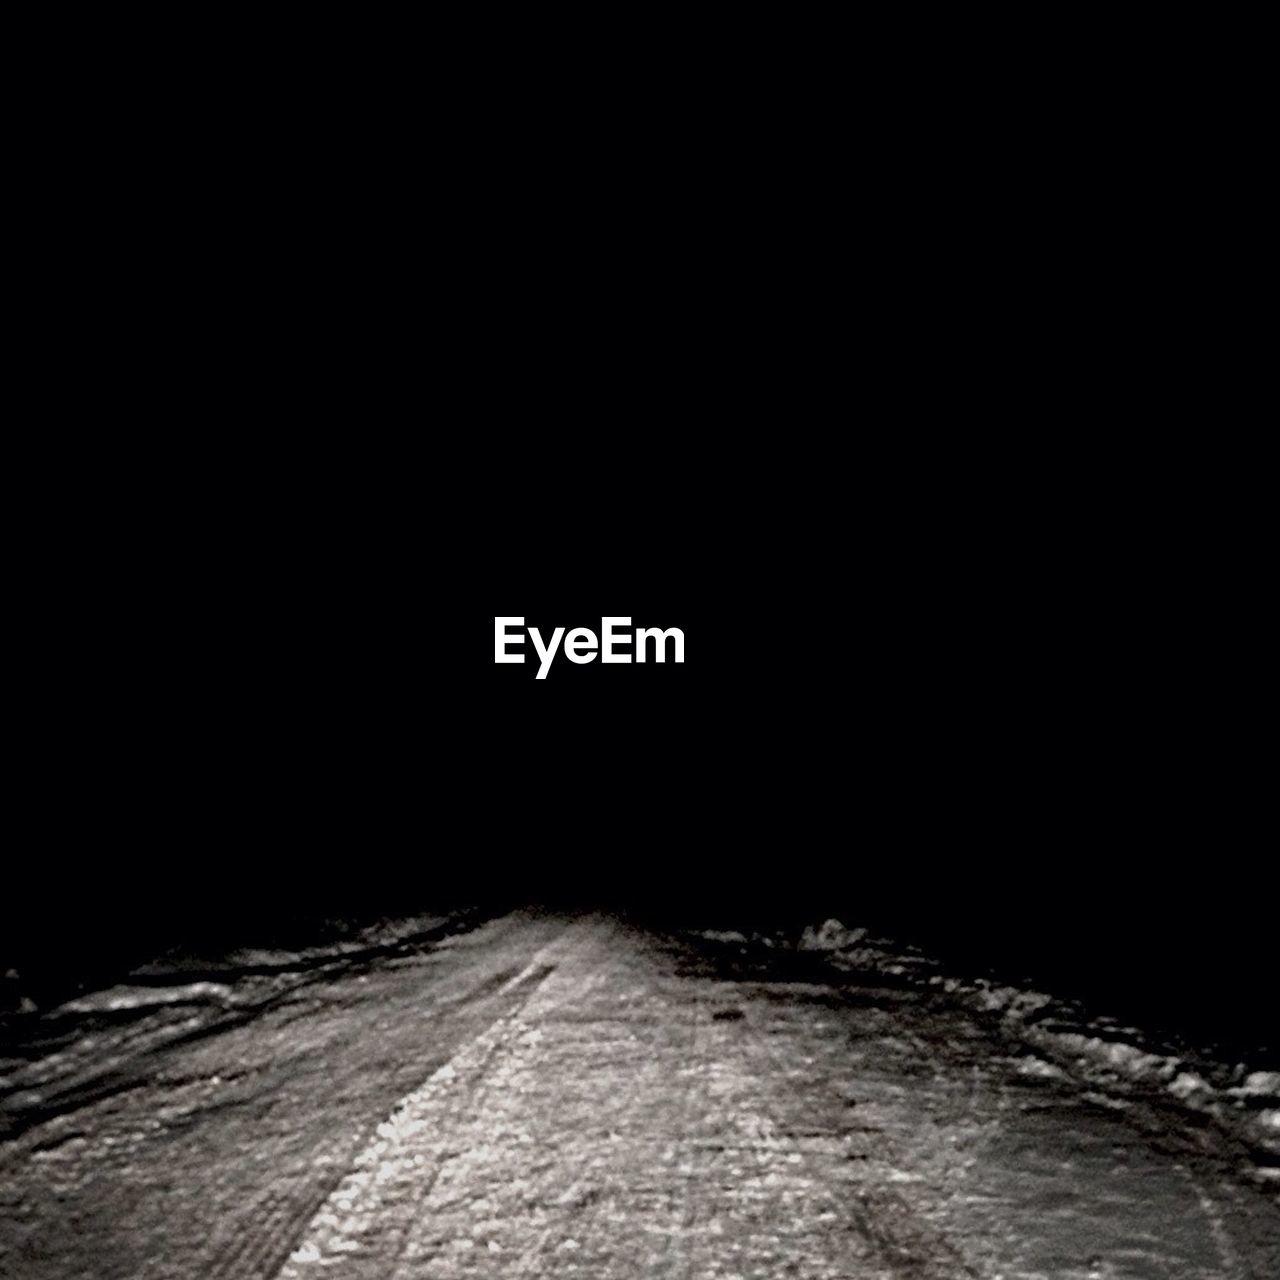 night, dark, road, black background, no people, outdoors